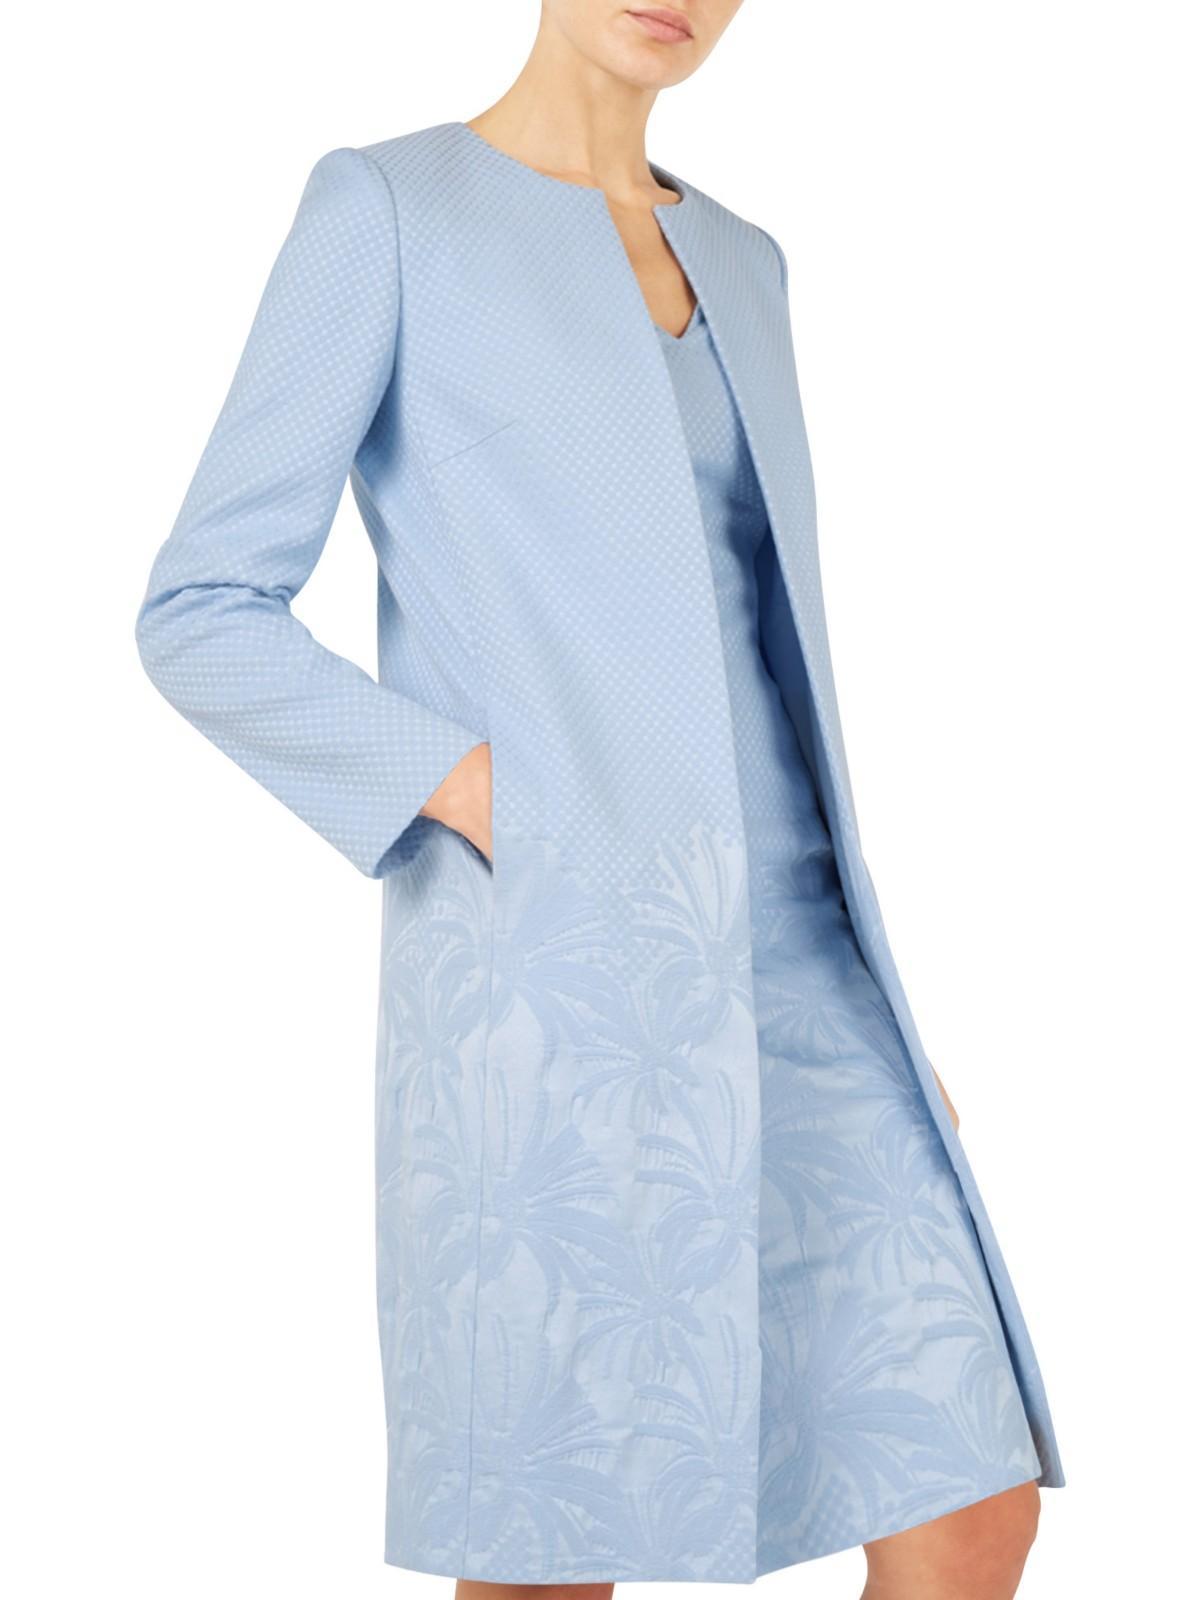 lyst jacques vert gradual textured jacket in blue. Black Bedroom Furniture Sets. Home Design Ideas